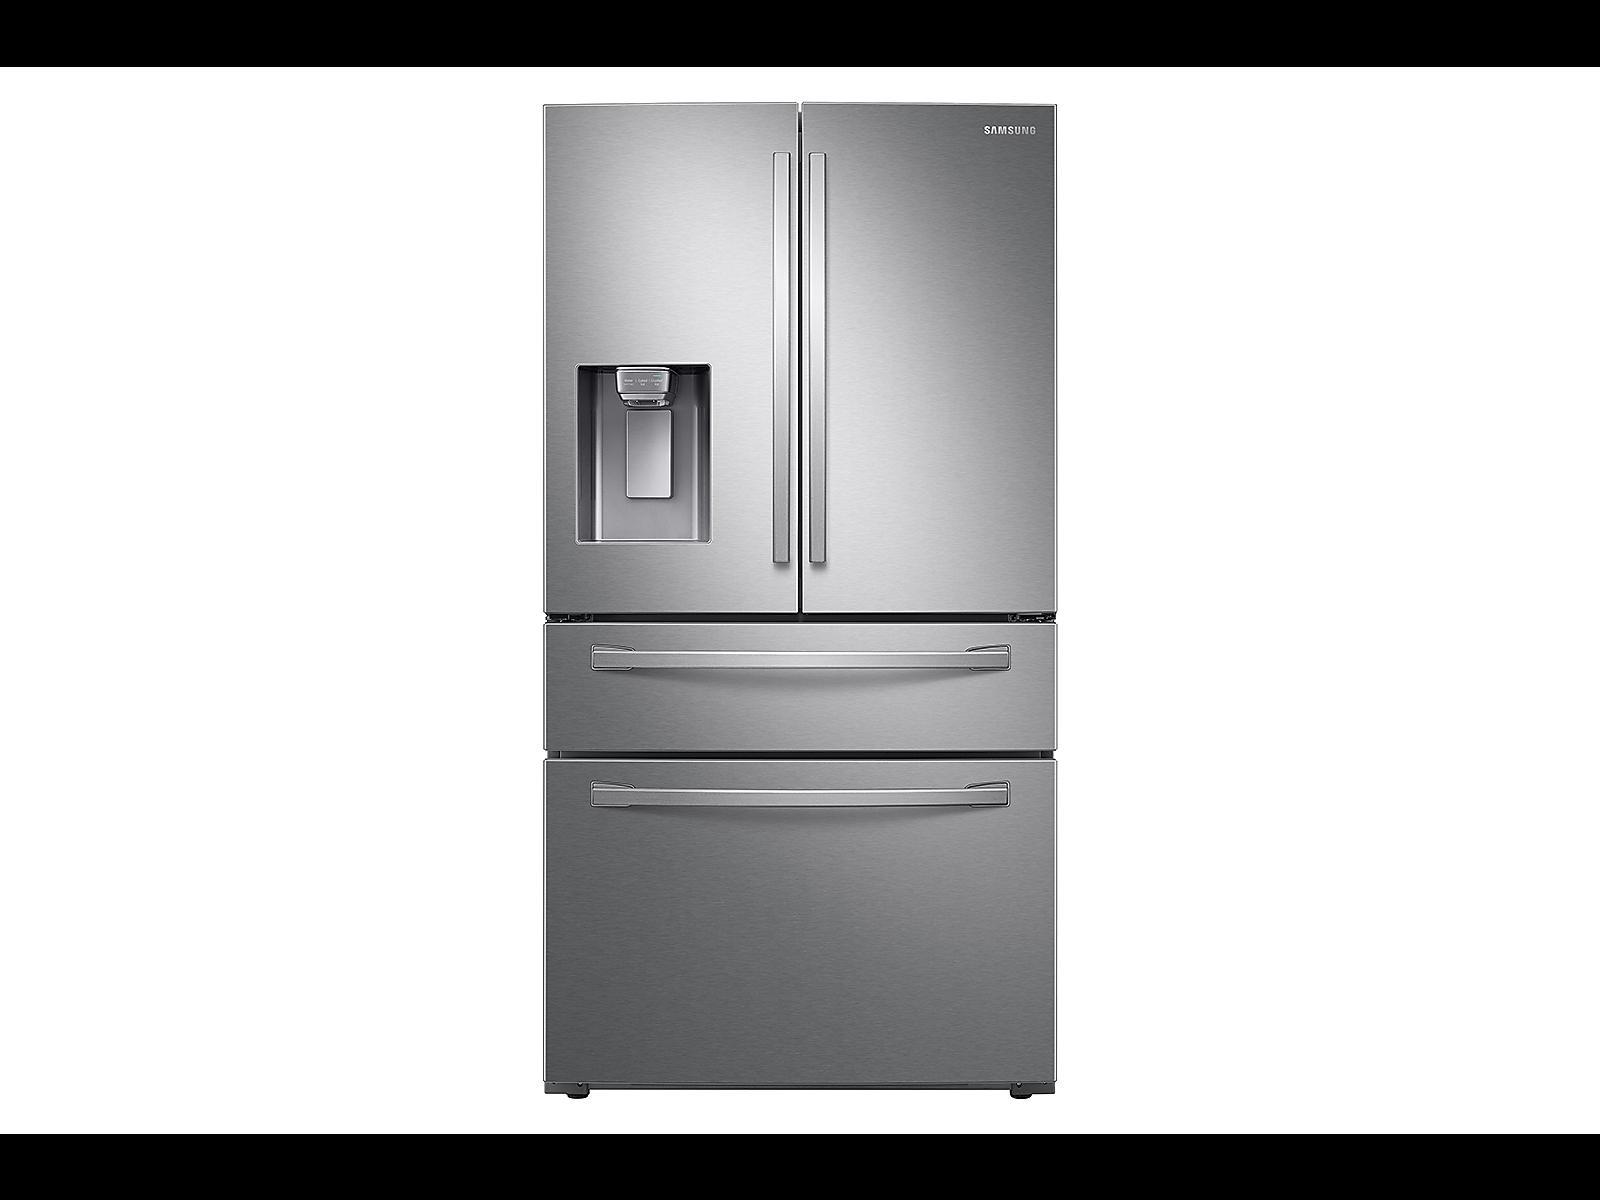 Samsung – 22.5 Cu. Ft. French Door Counter-Depth Refrigerator